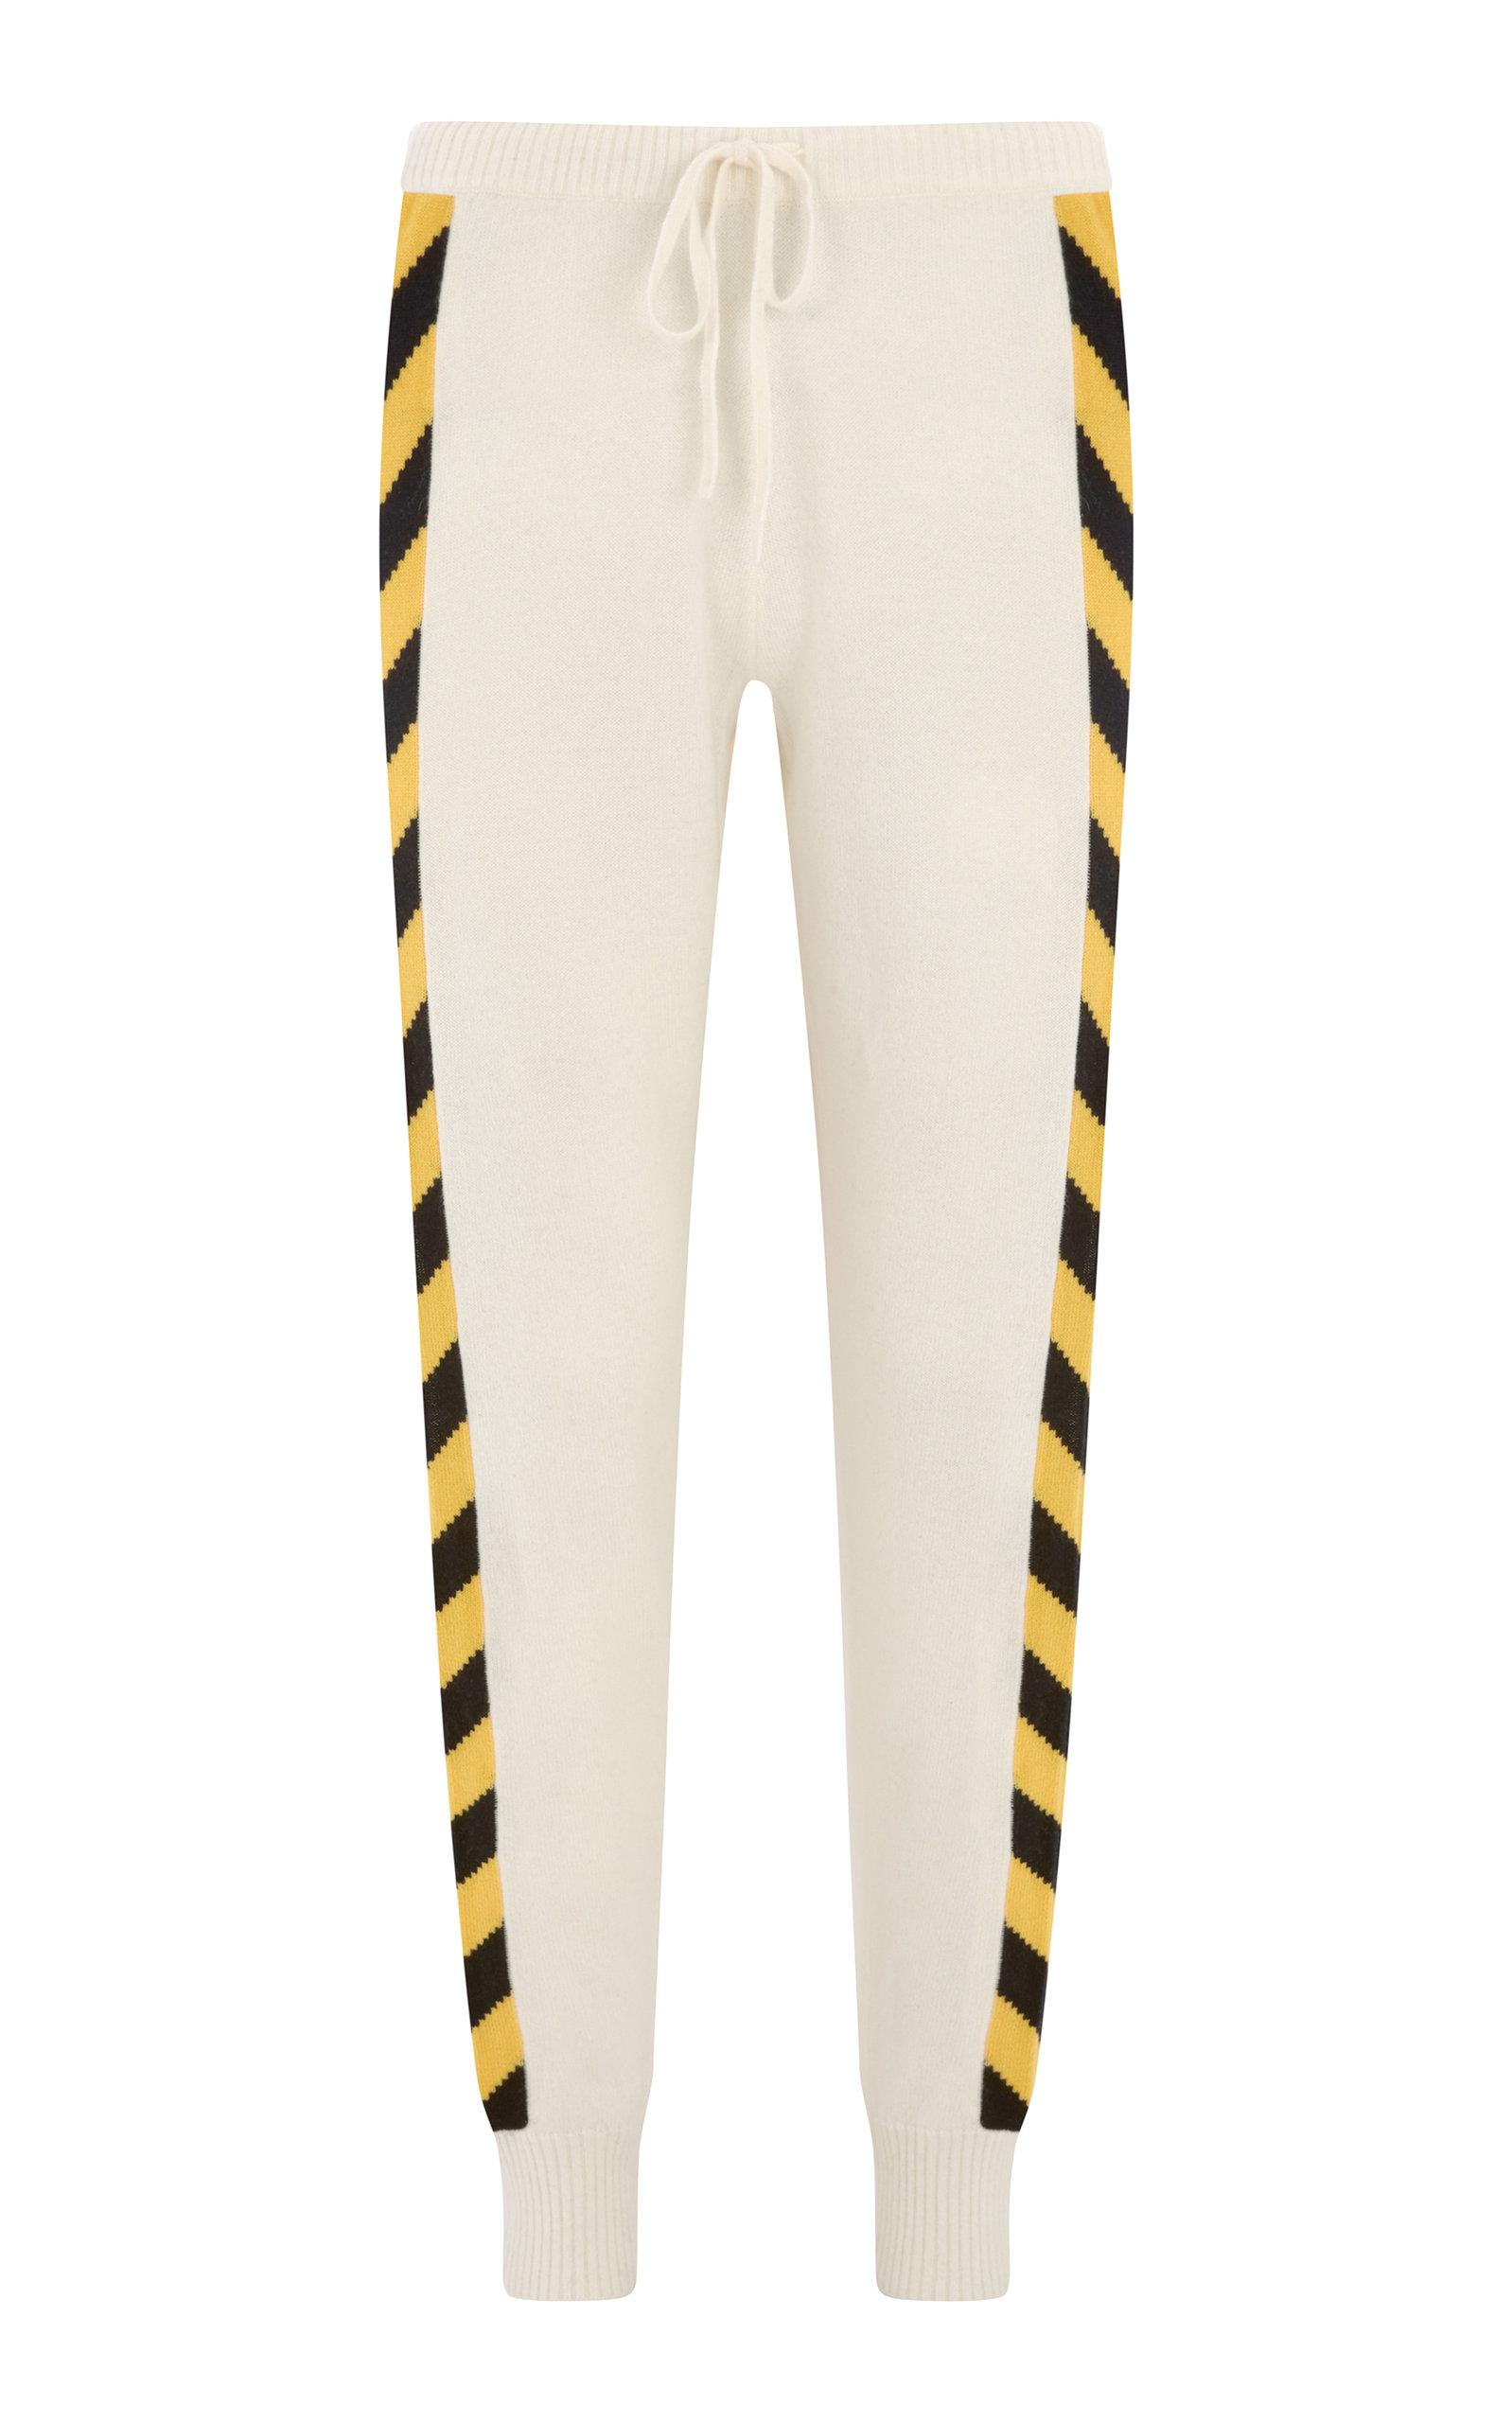 Nix Slim-Fit Cashmere Jogging Bottoms, White